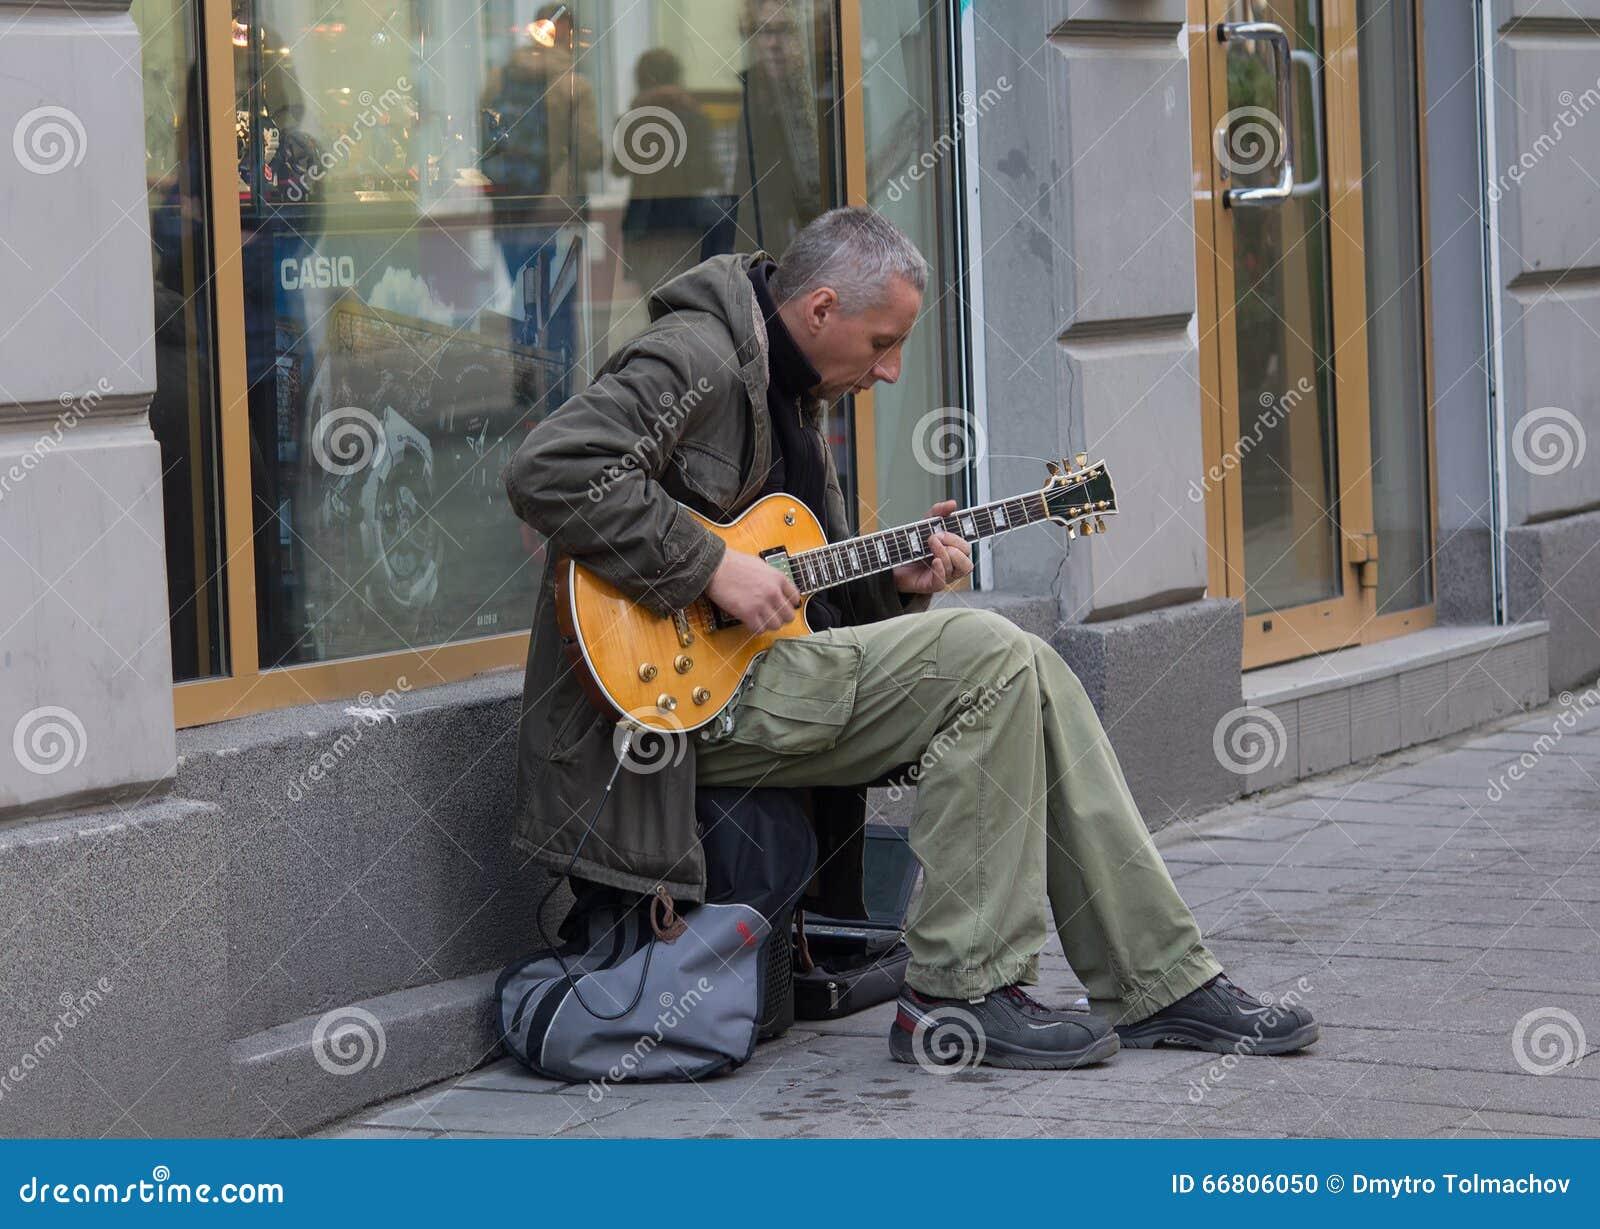 lviv ukraine october 18 2015 street musician playing an electric guitar editorial image. Black Bedroom Furniture Sets. Home Design Ideas